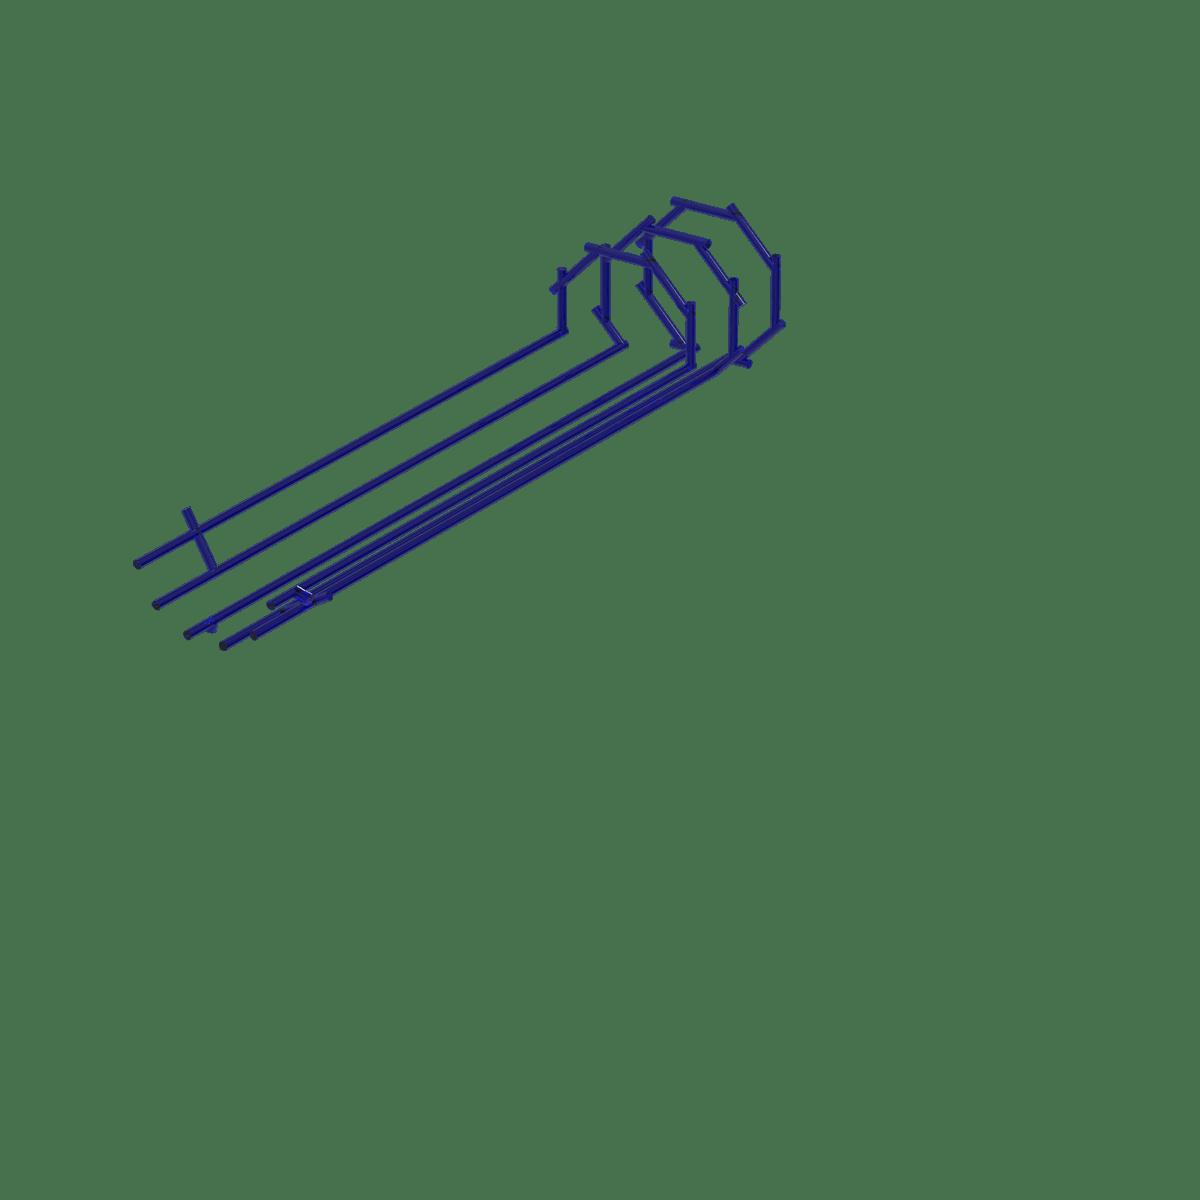 Sleeve Gun-Drilled Holes